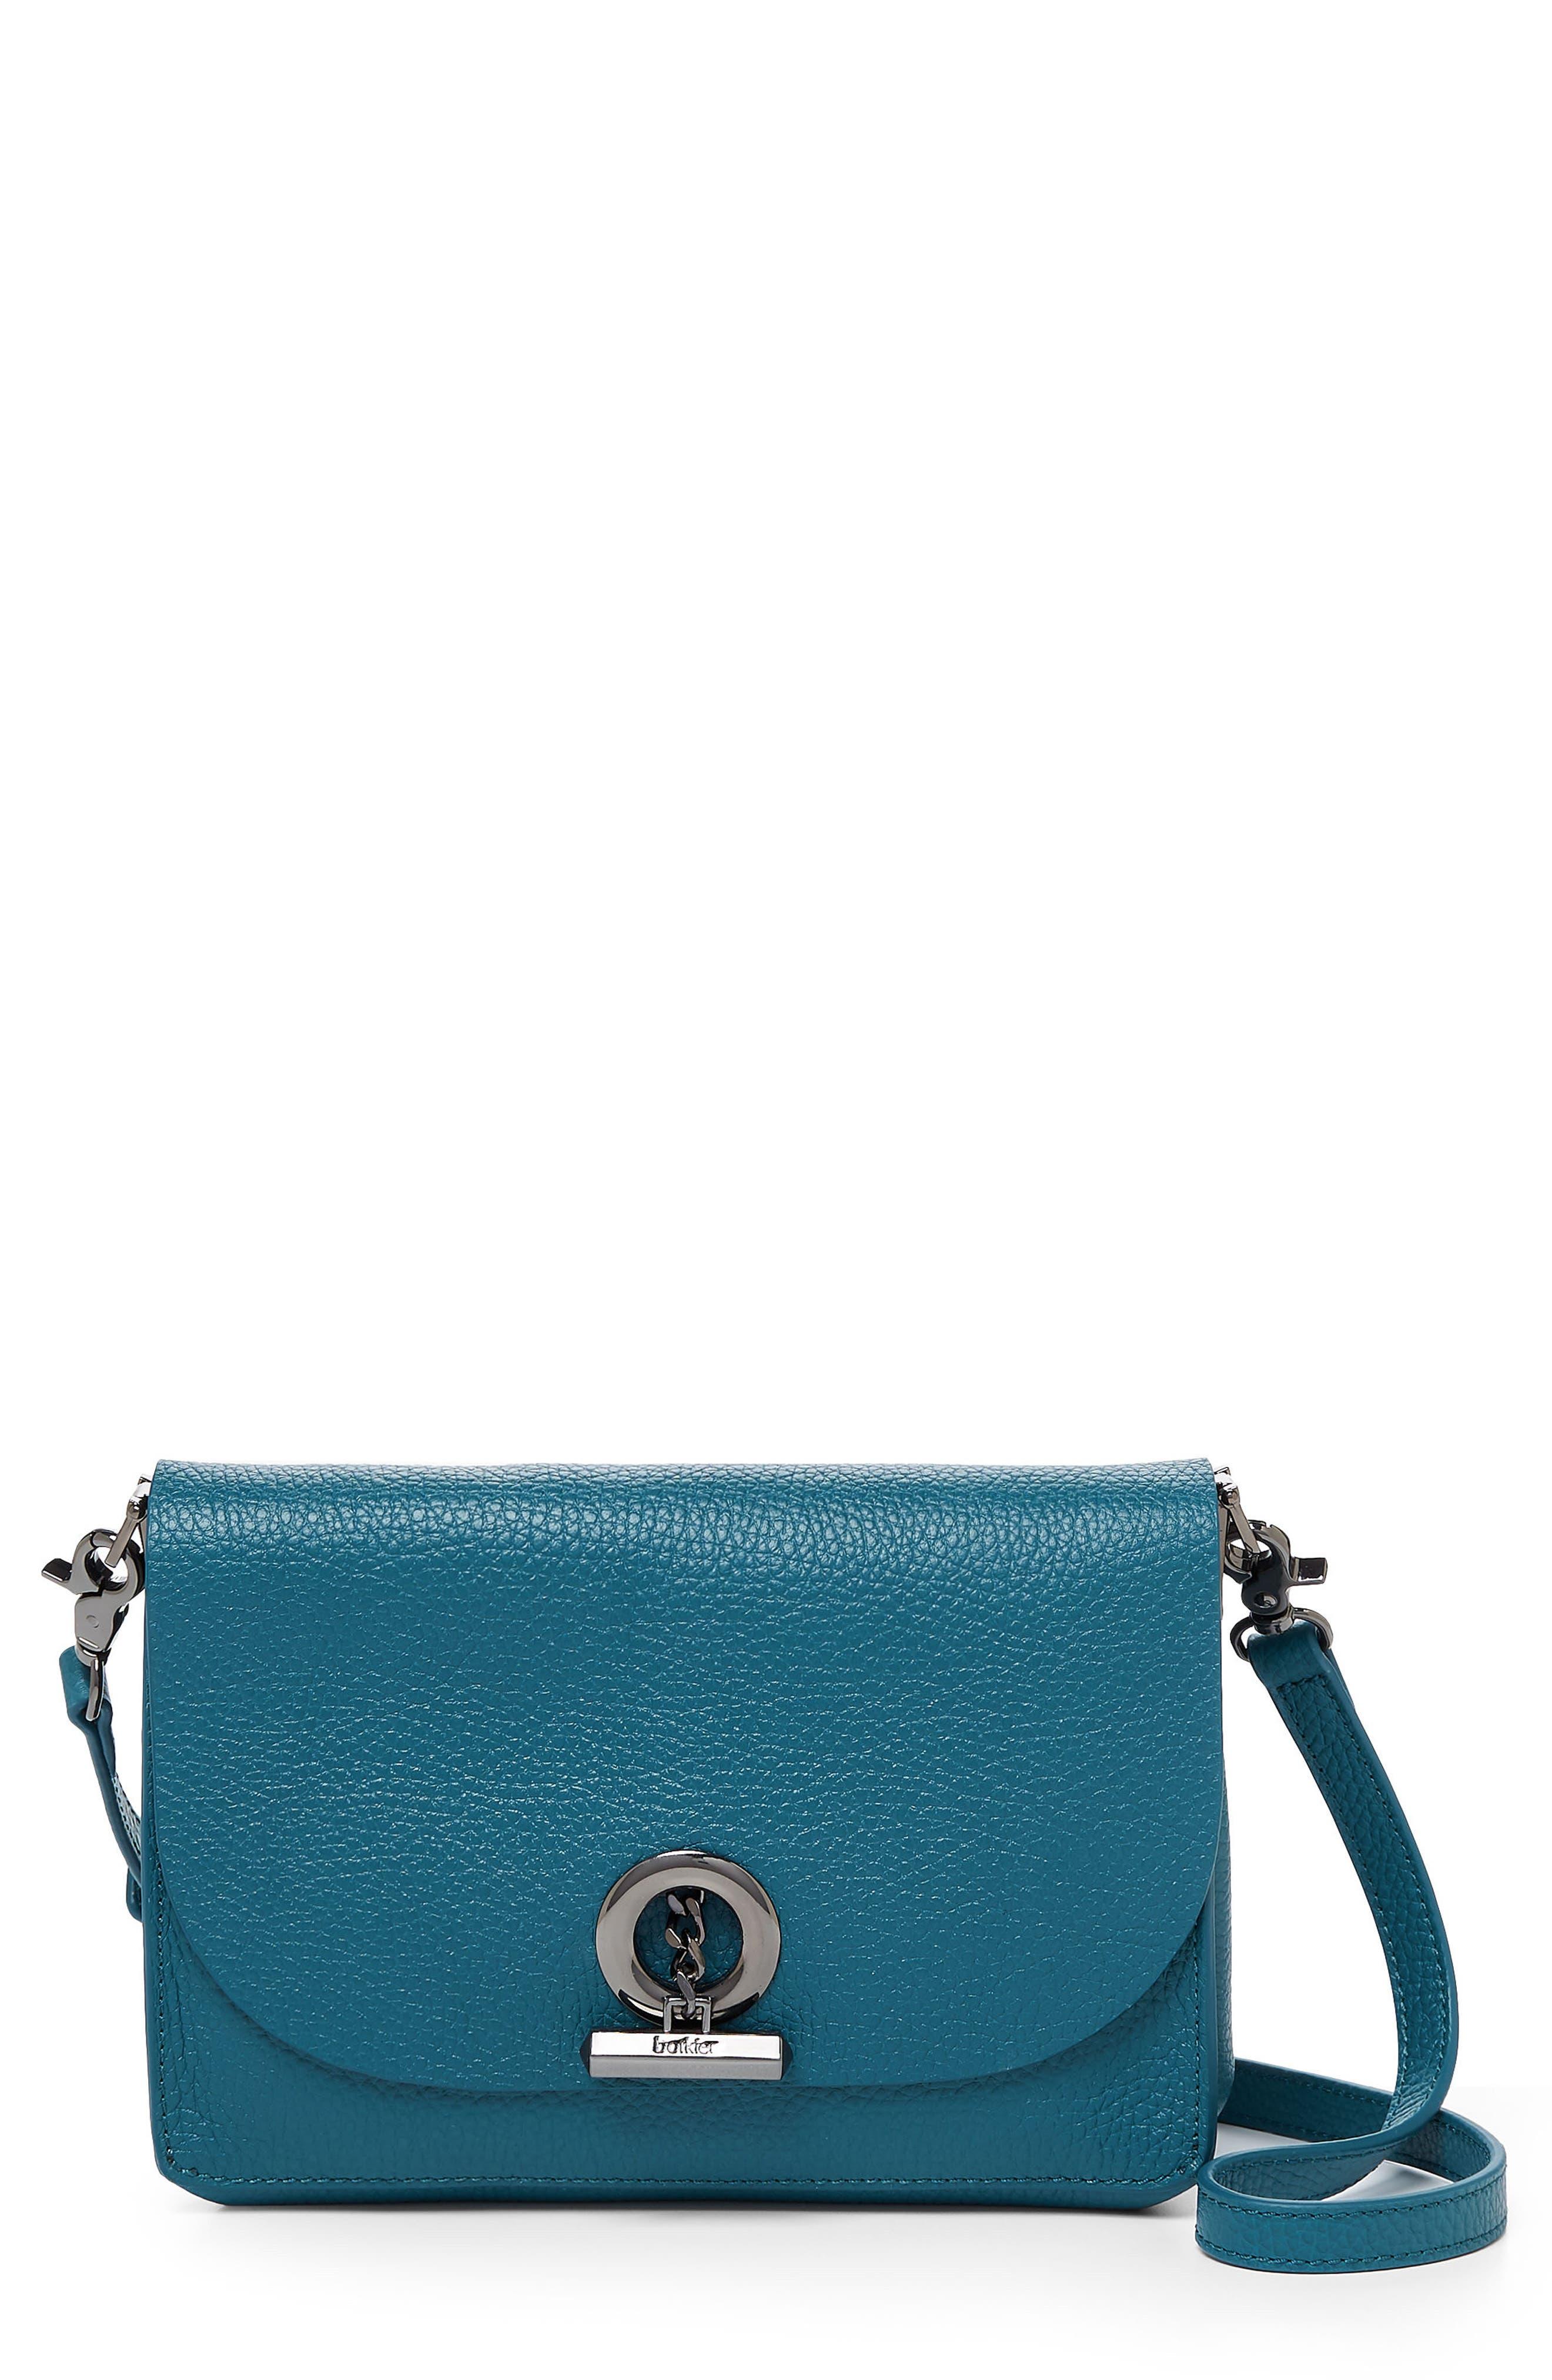 Waverly Leather Crossbody Bag,                             Main thumbnail 1, color,                             Lagoon